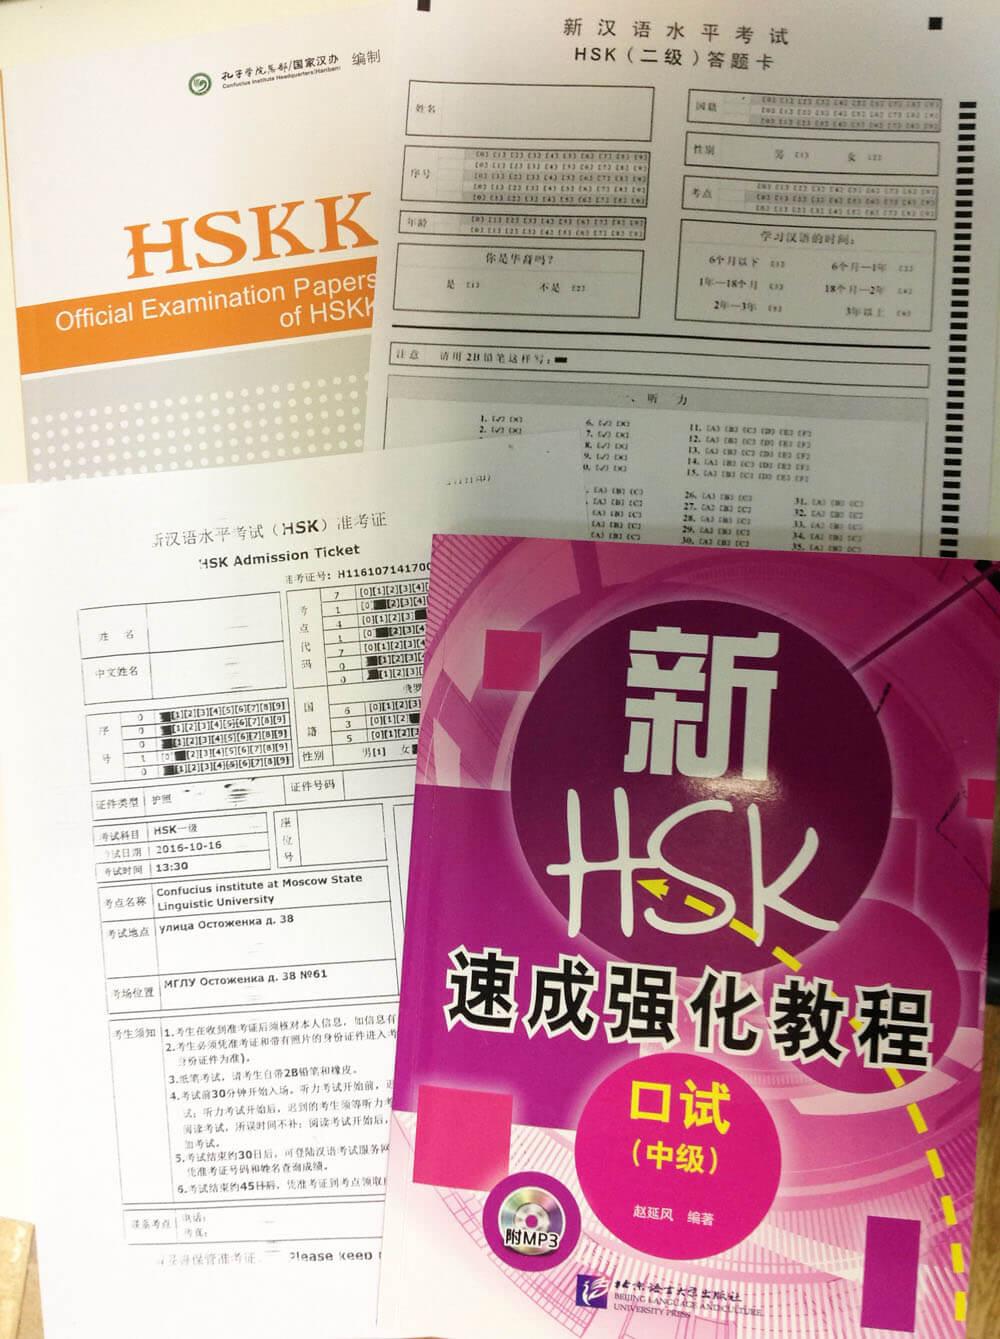 Материалы HSK, анкеты и бланки HSK